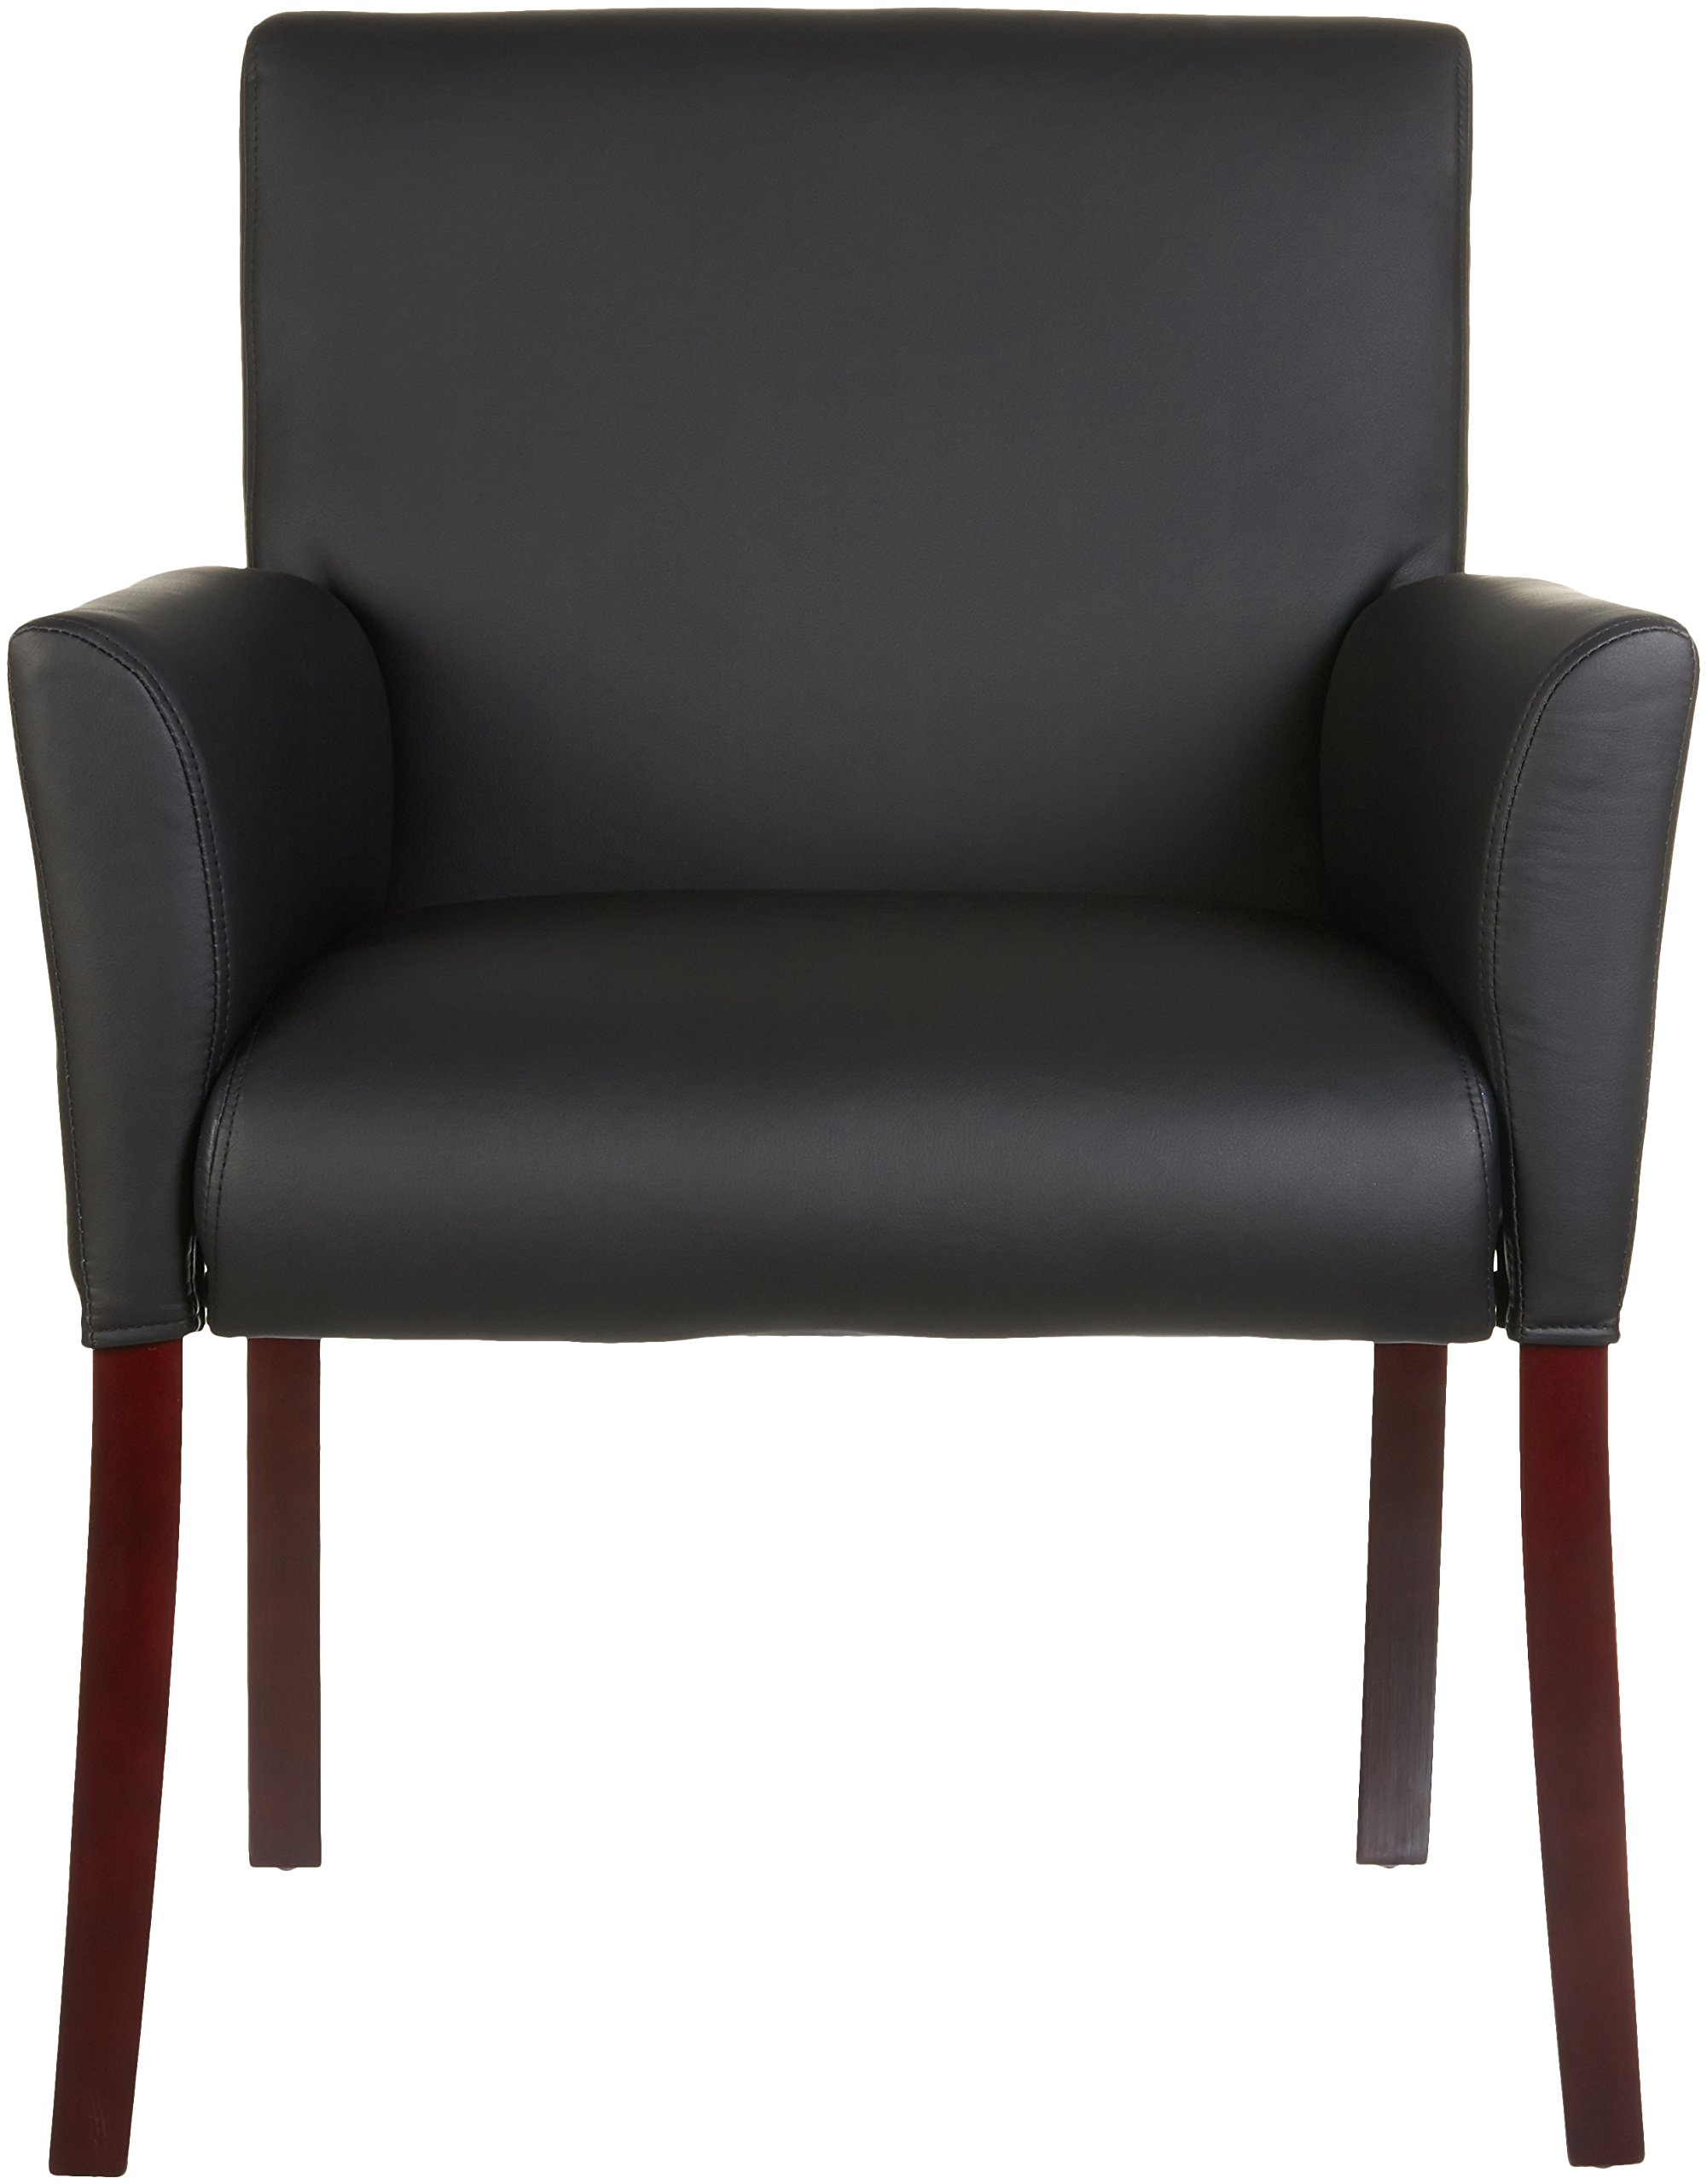 AmazonBasics Reception Chair, Black by AmazonBasics (Image #3)